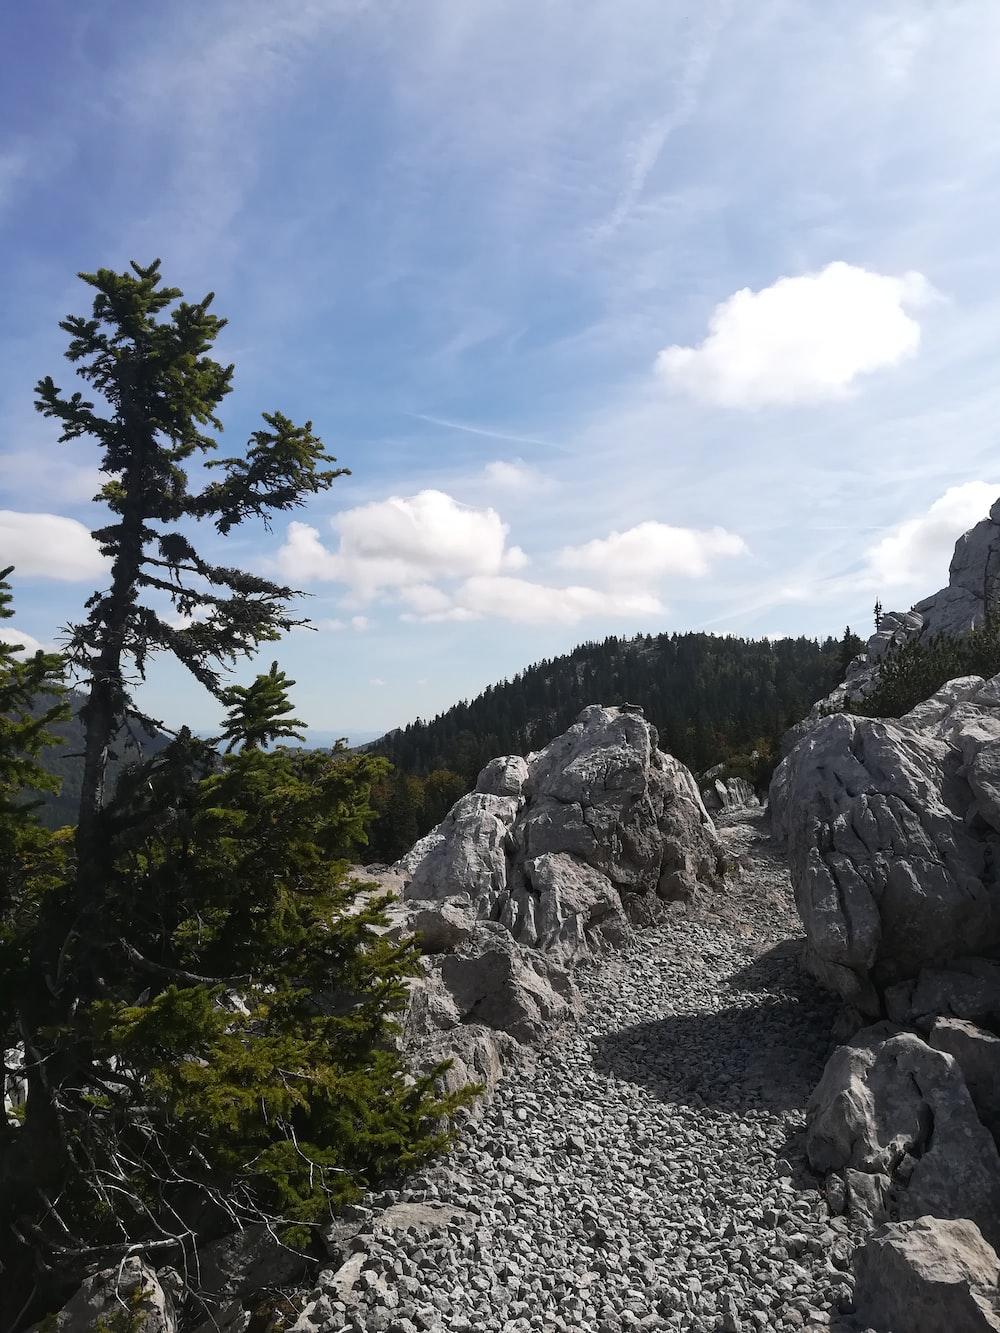 gray rocks under blue sky